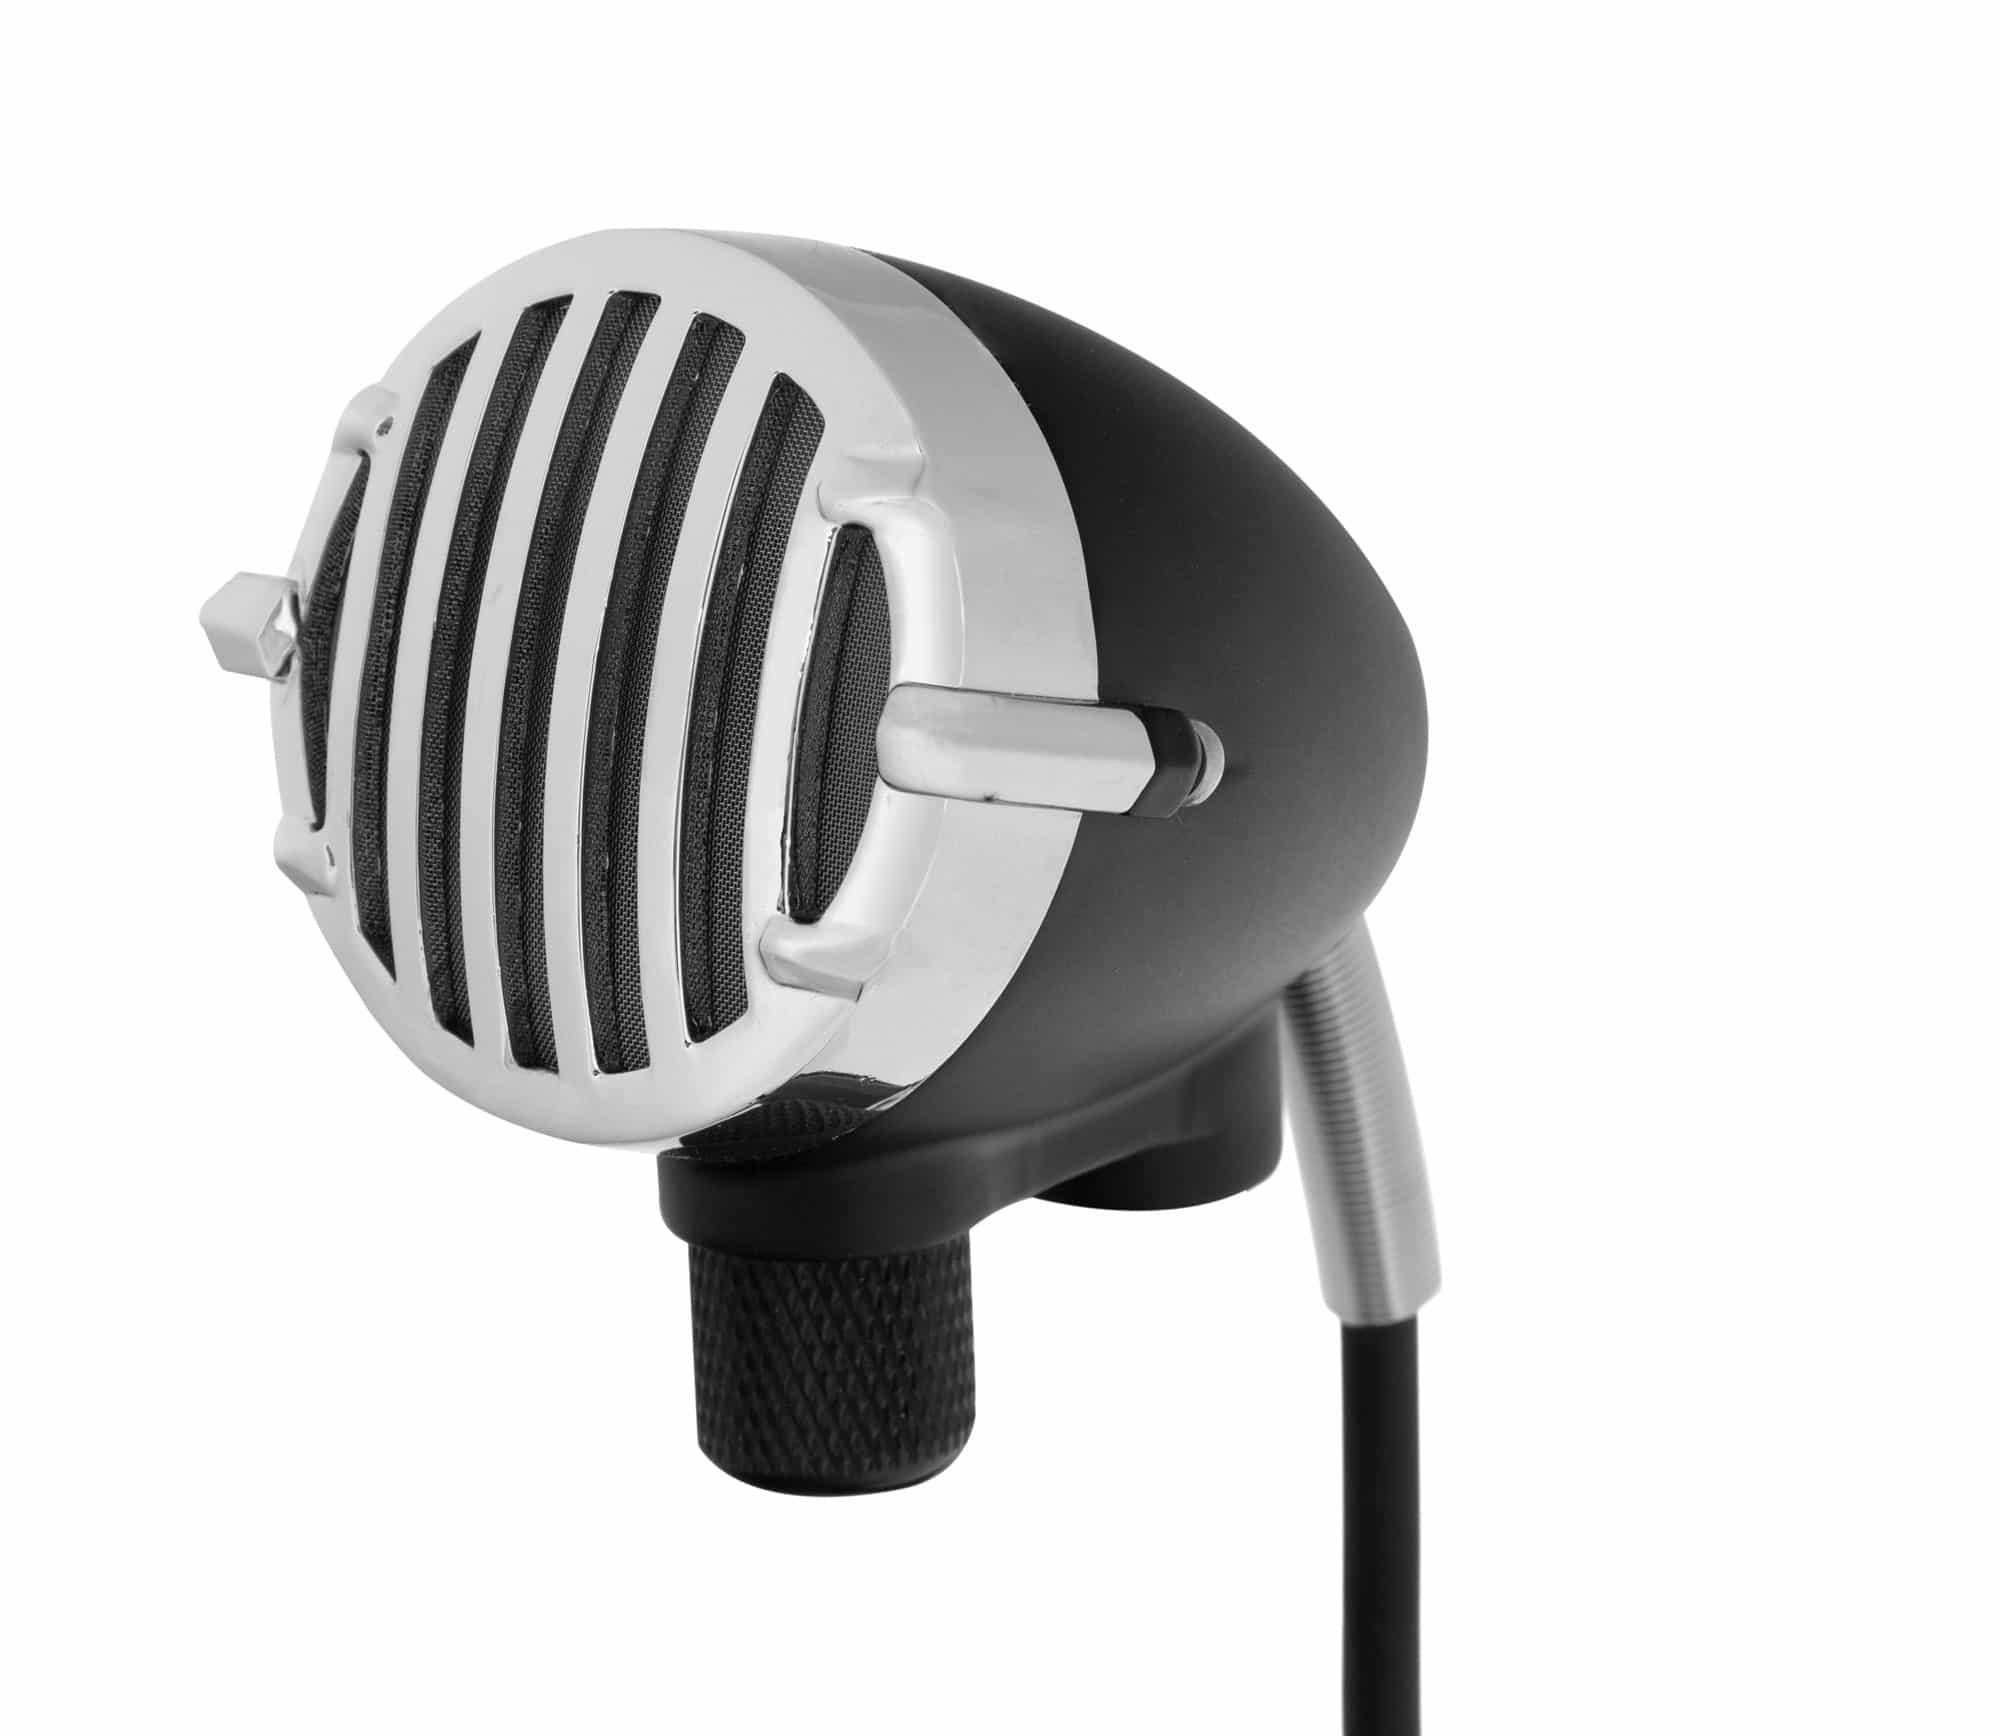 Pronomic HM 2 Vintage Mundharmonika Vocal Mikrofon